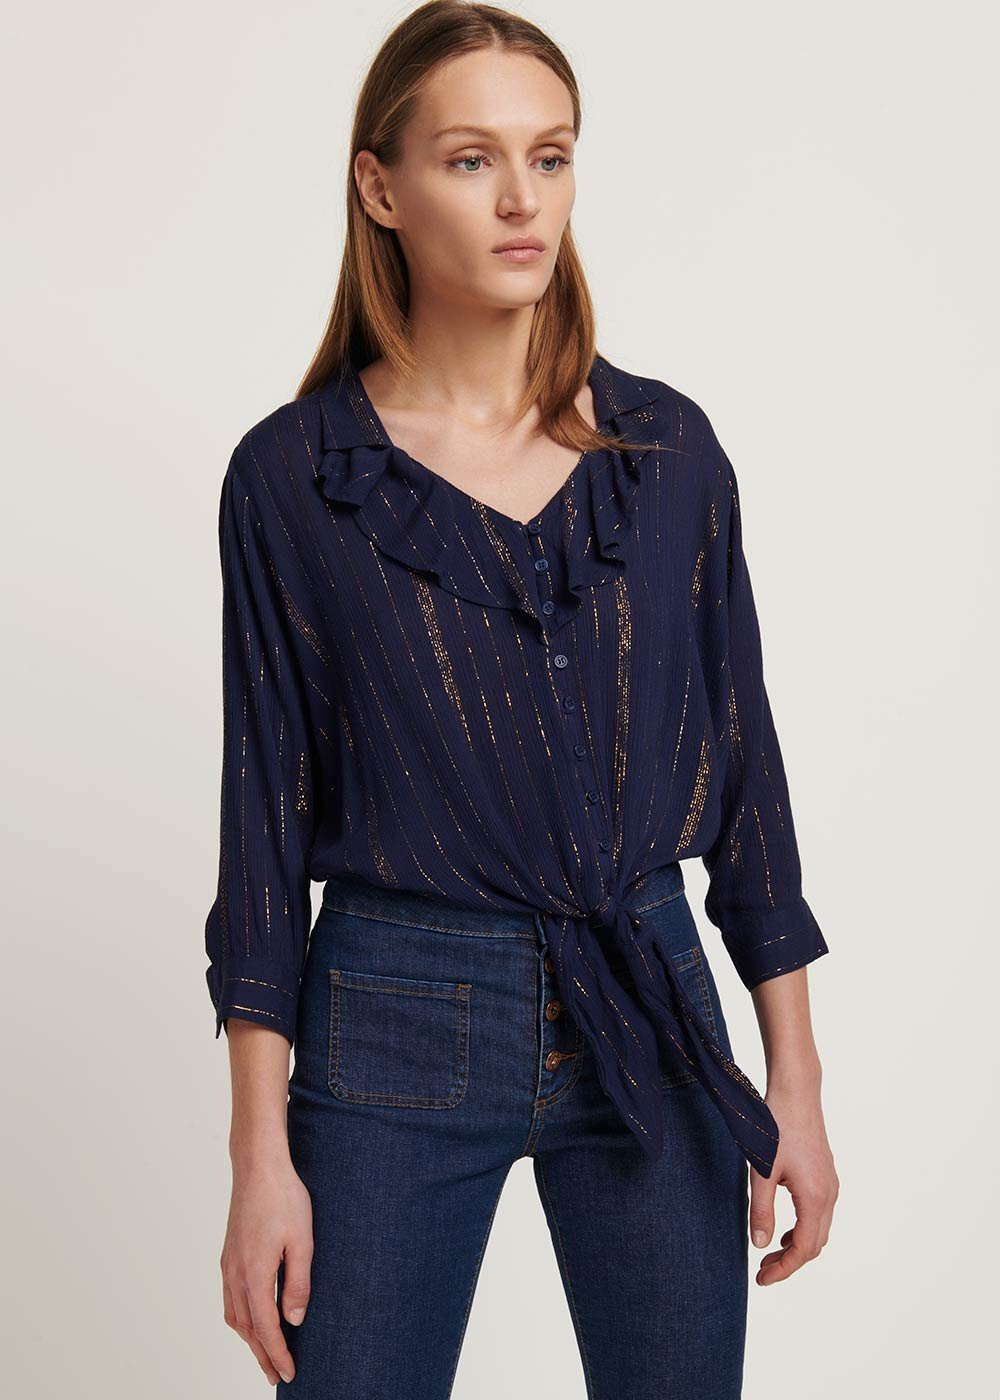 Carola blouse with lurex threads - Medium Blue - Woman